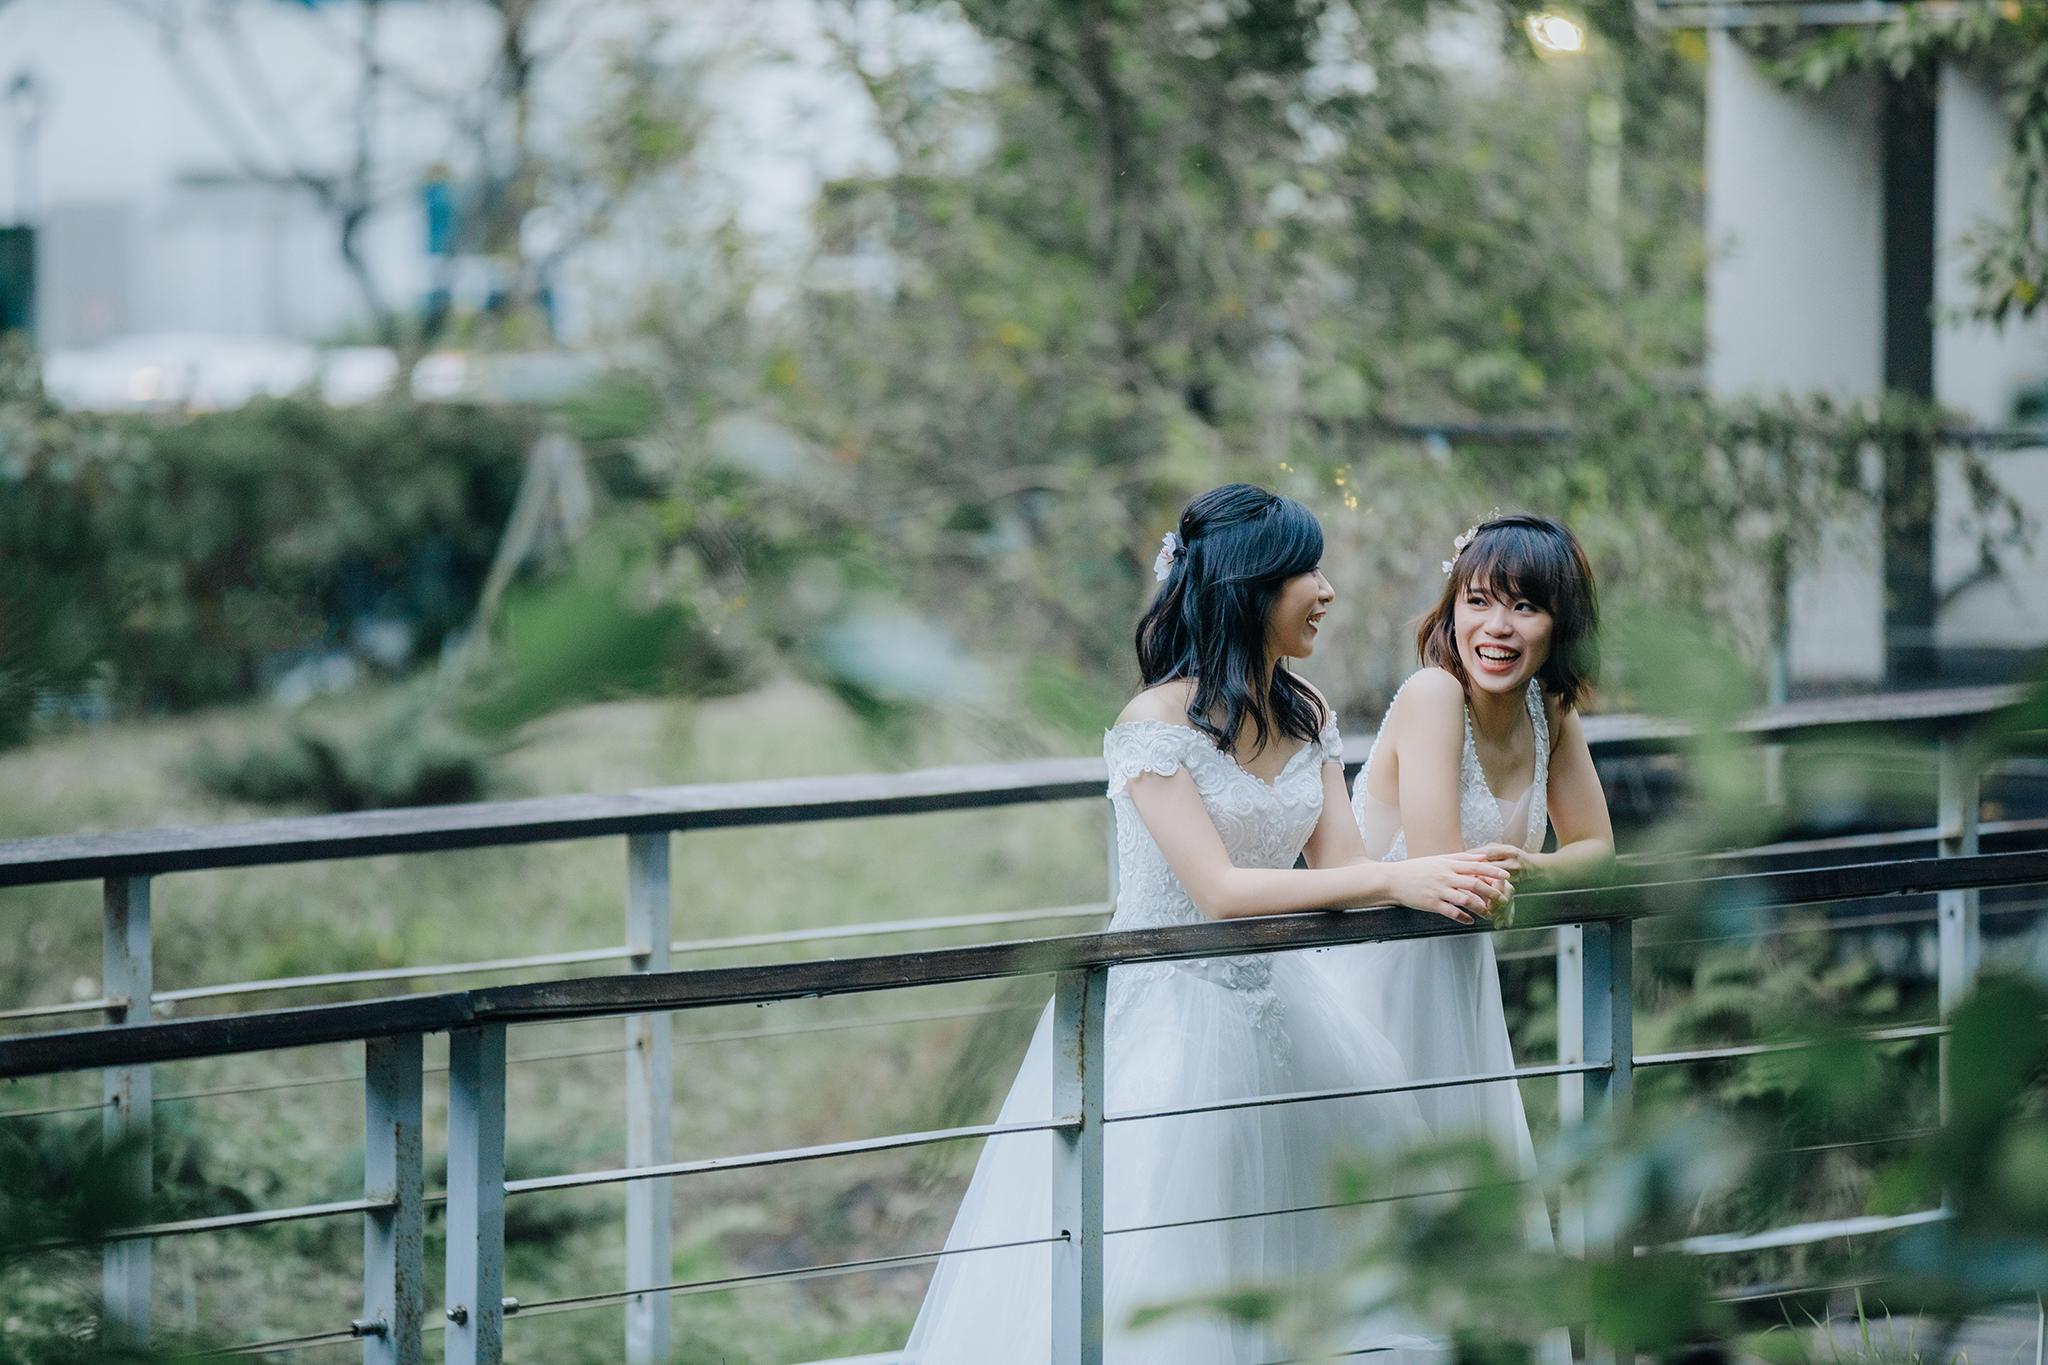 47815669472 6396955385 o - 【閨蜜婚紗】+育誠&娟羽&映煦+